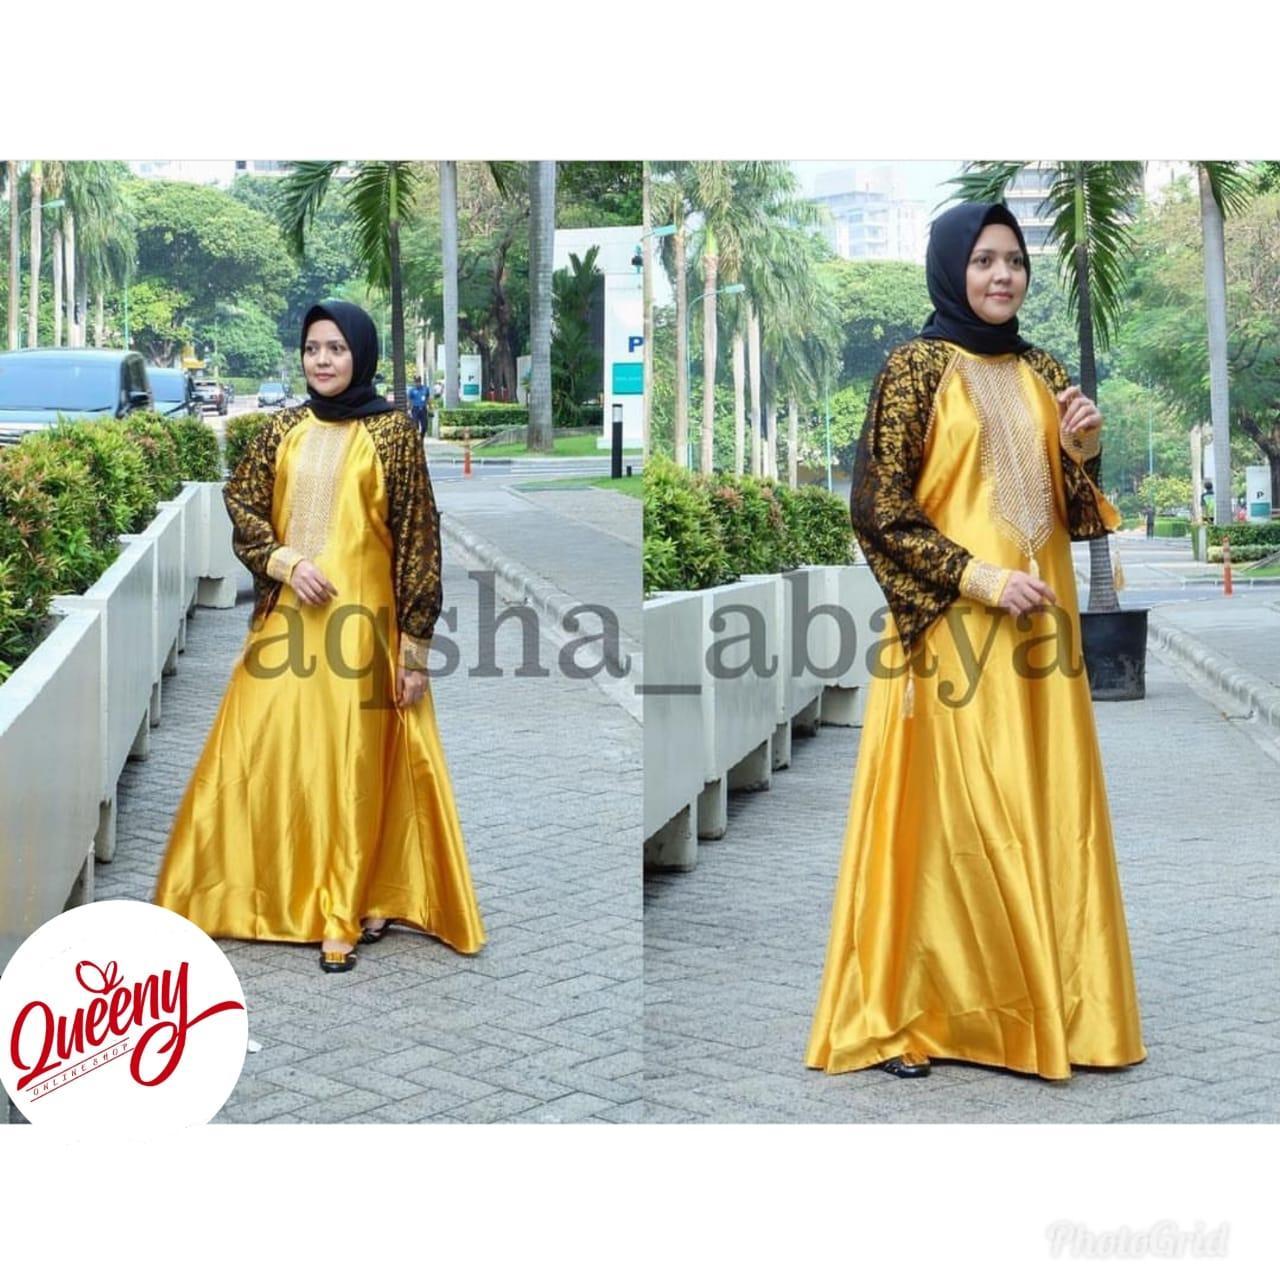 gamis abaya muslimah / abaya arab islami / abaya satin marbella fashion muslim kombinasi tangan brukat